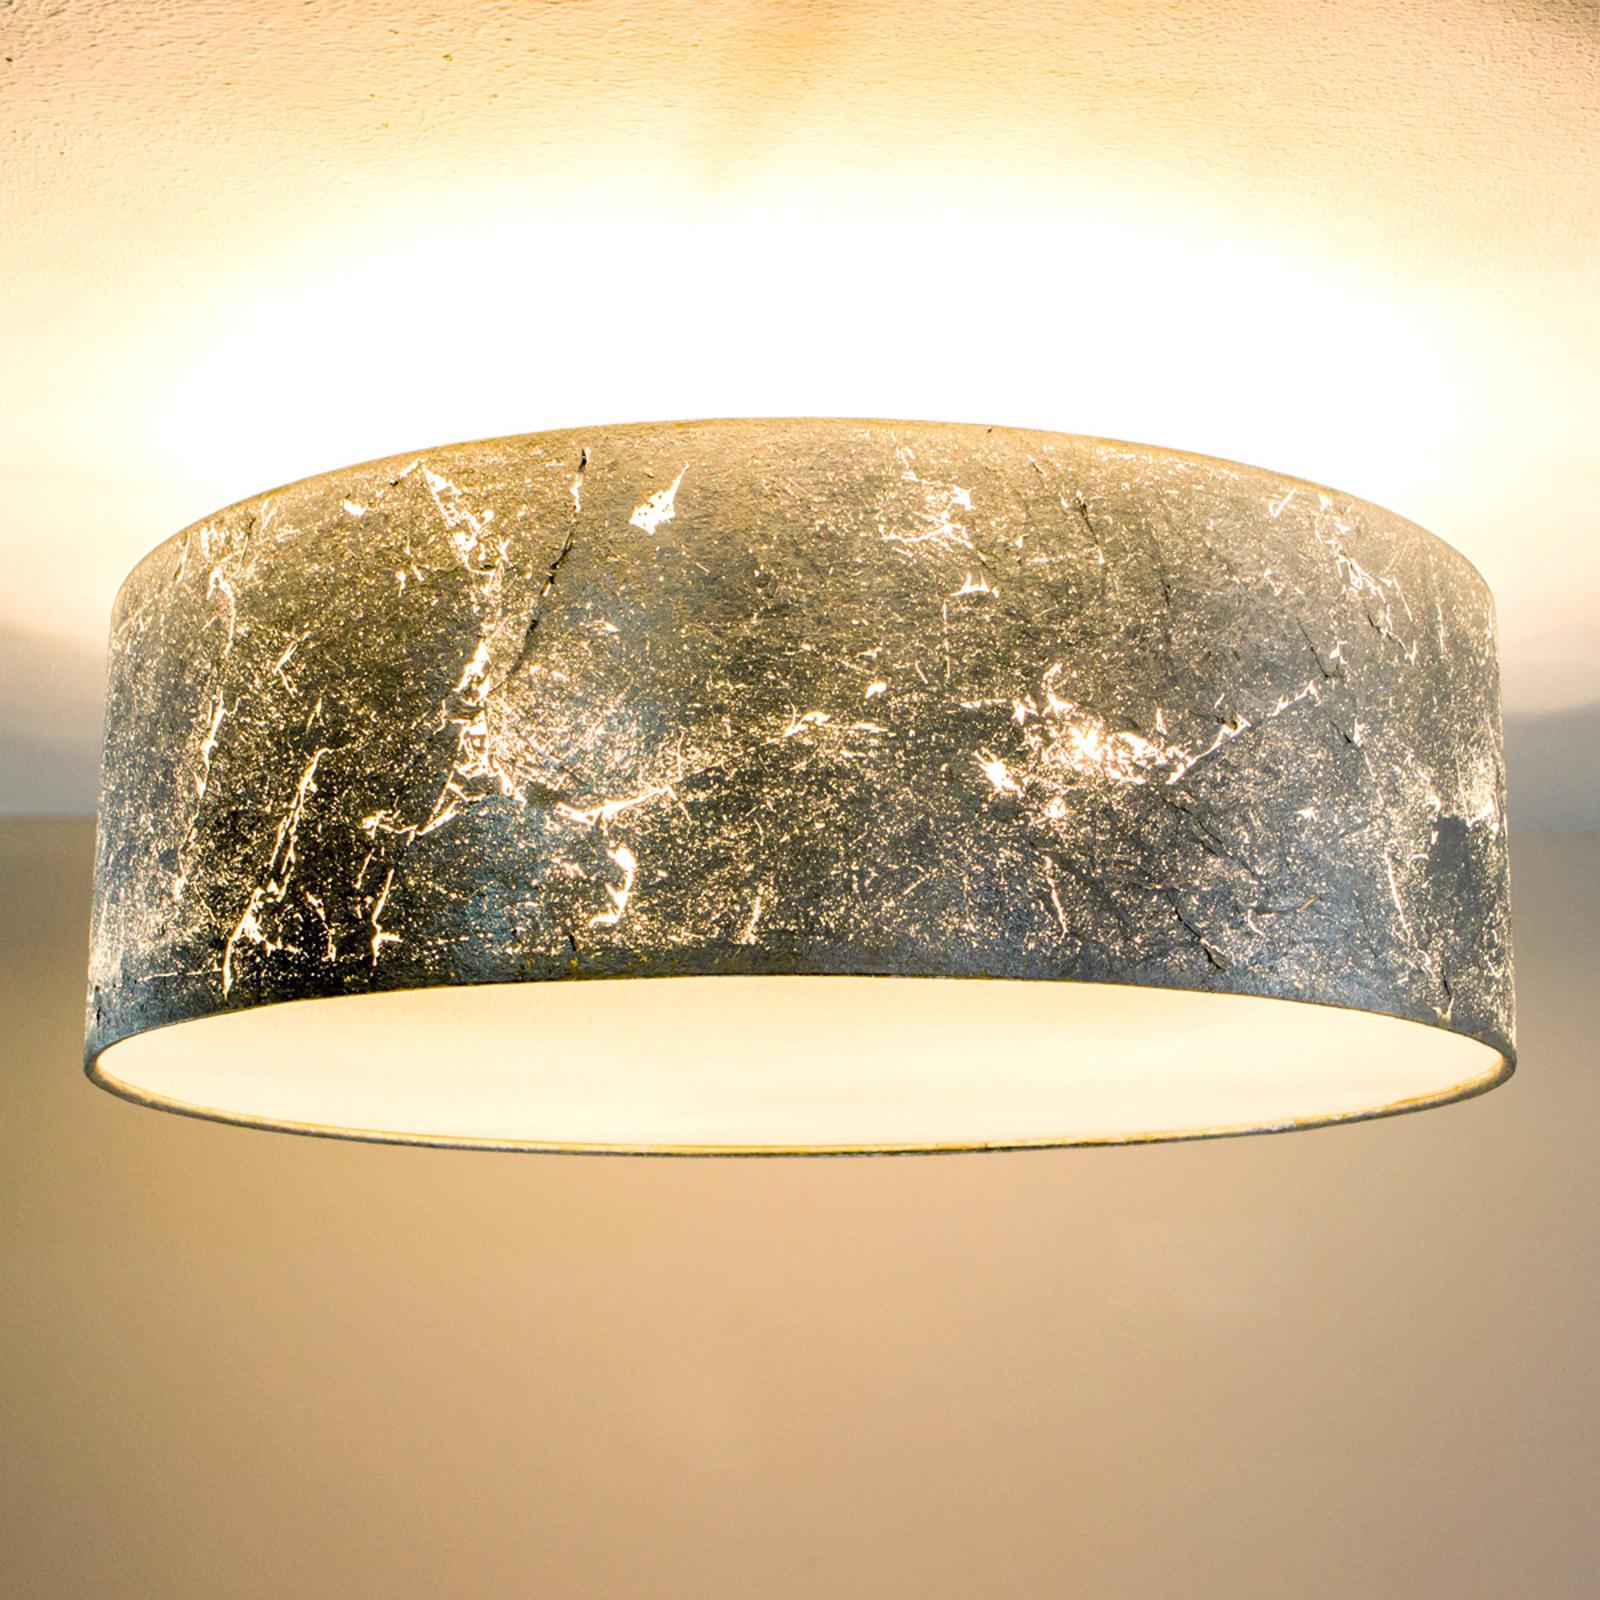 Deckenlampe Aura, belegt m. silbernem Schlagmetall